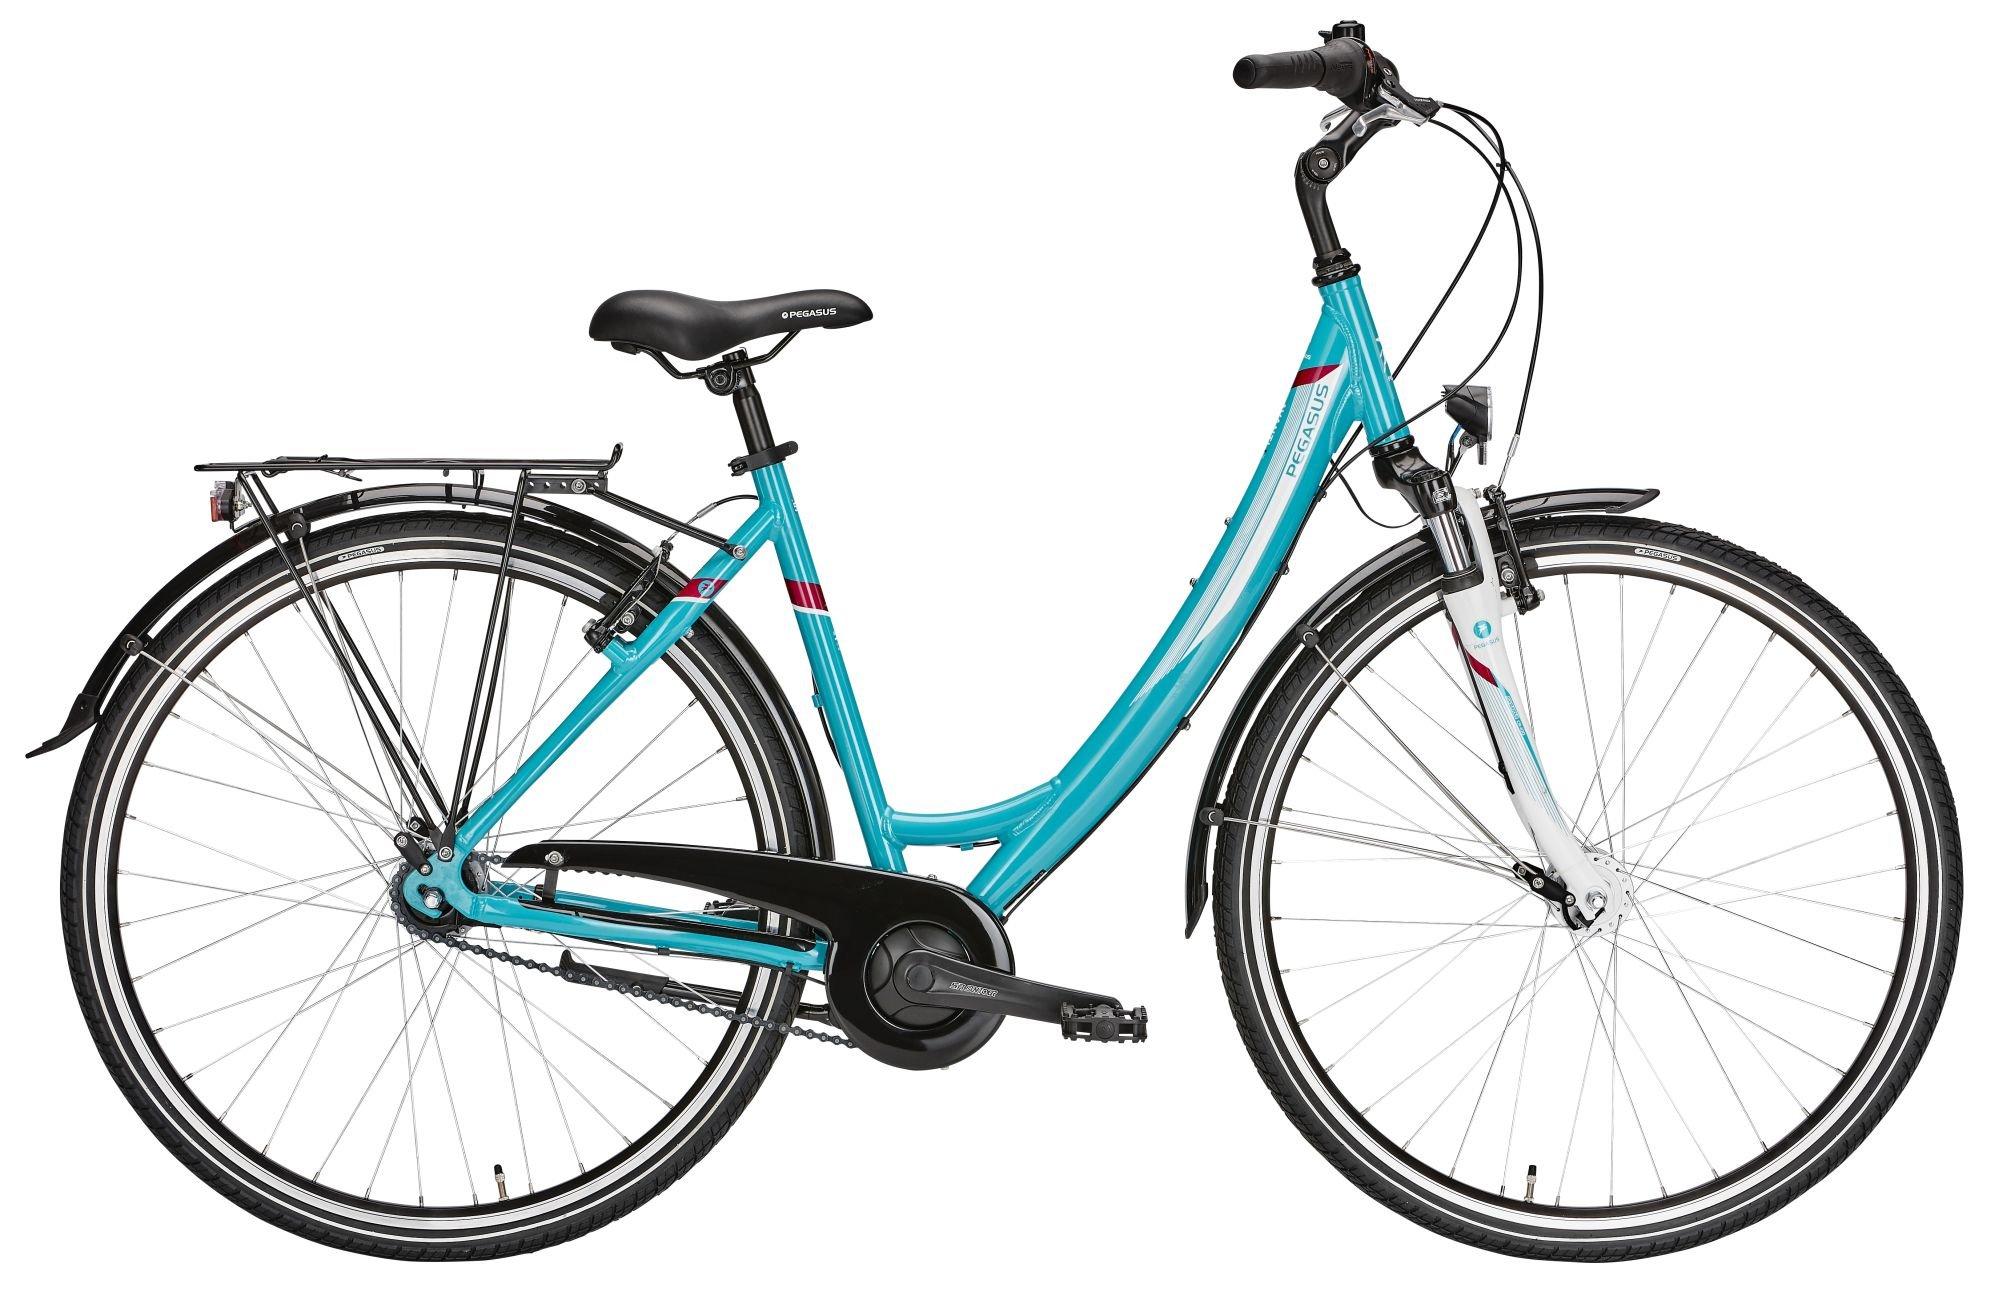 city-/tourenräder/Citybikes: Pegasus  Avanti 7 7 Gang Nabenschaltung Damenfahrrad Wave Modell 2021 28 Zoll 55 cm